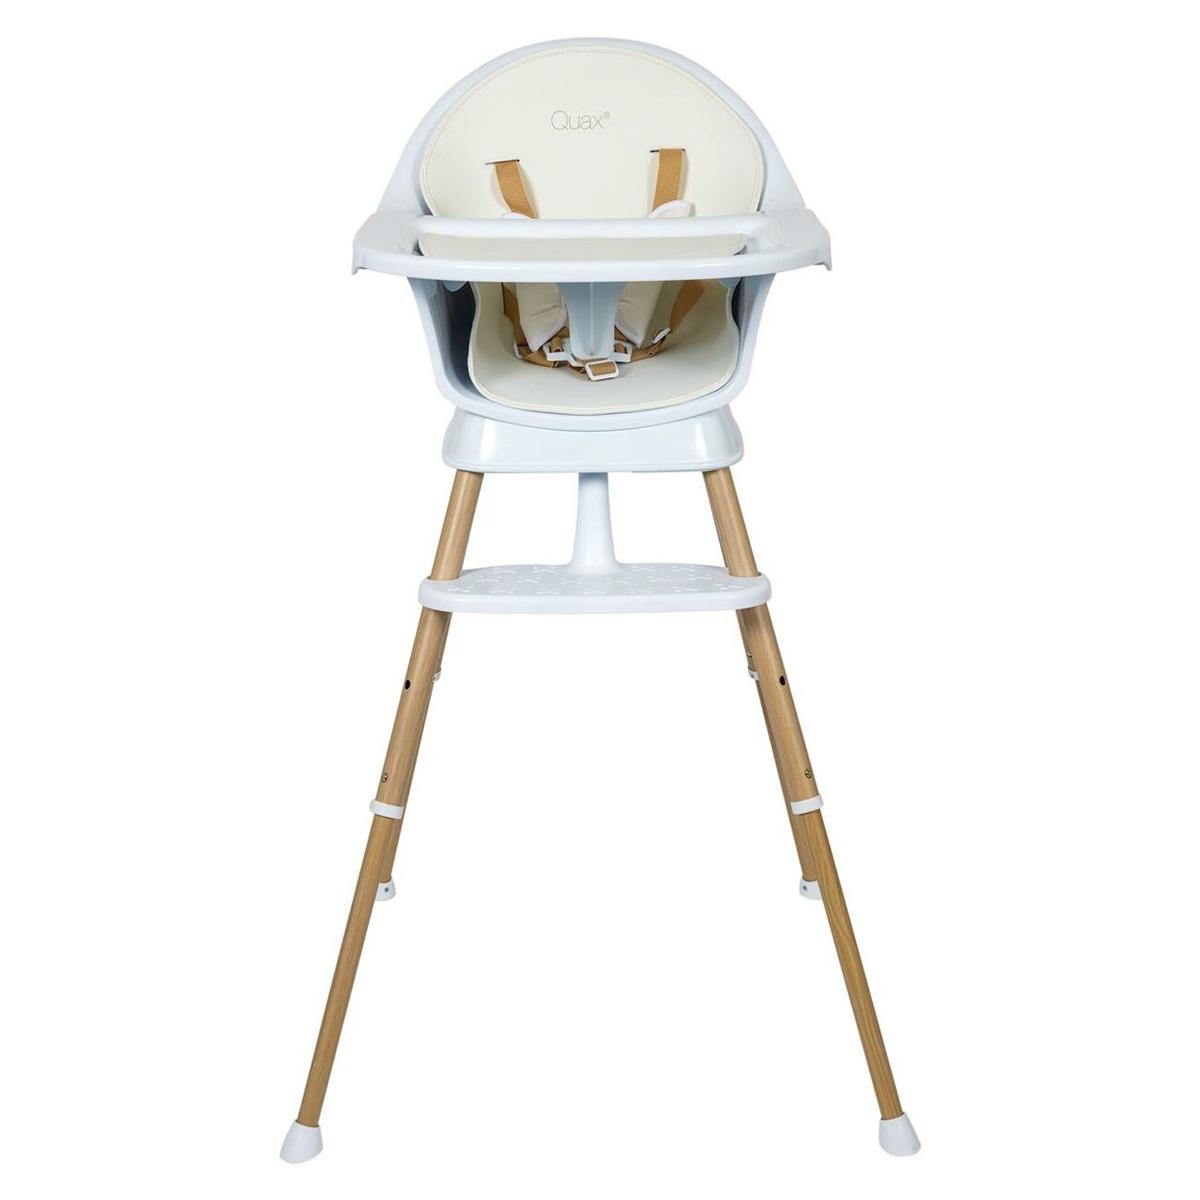 Chaise haute Chaise Haute Ultimo 3 Luxe - White & Naturel Chaise Haute Ultimo 3 Luxe - White & Naturel